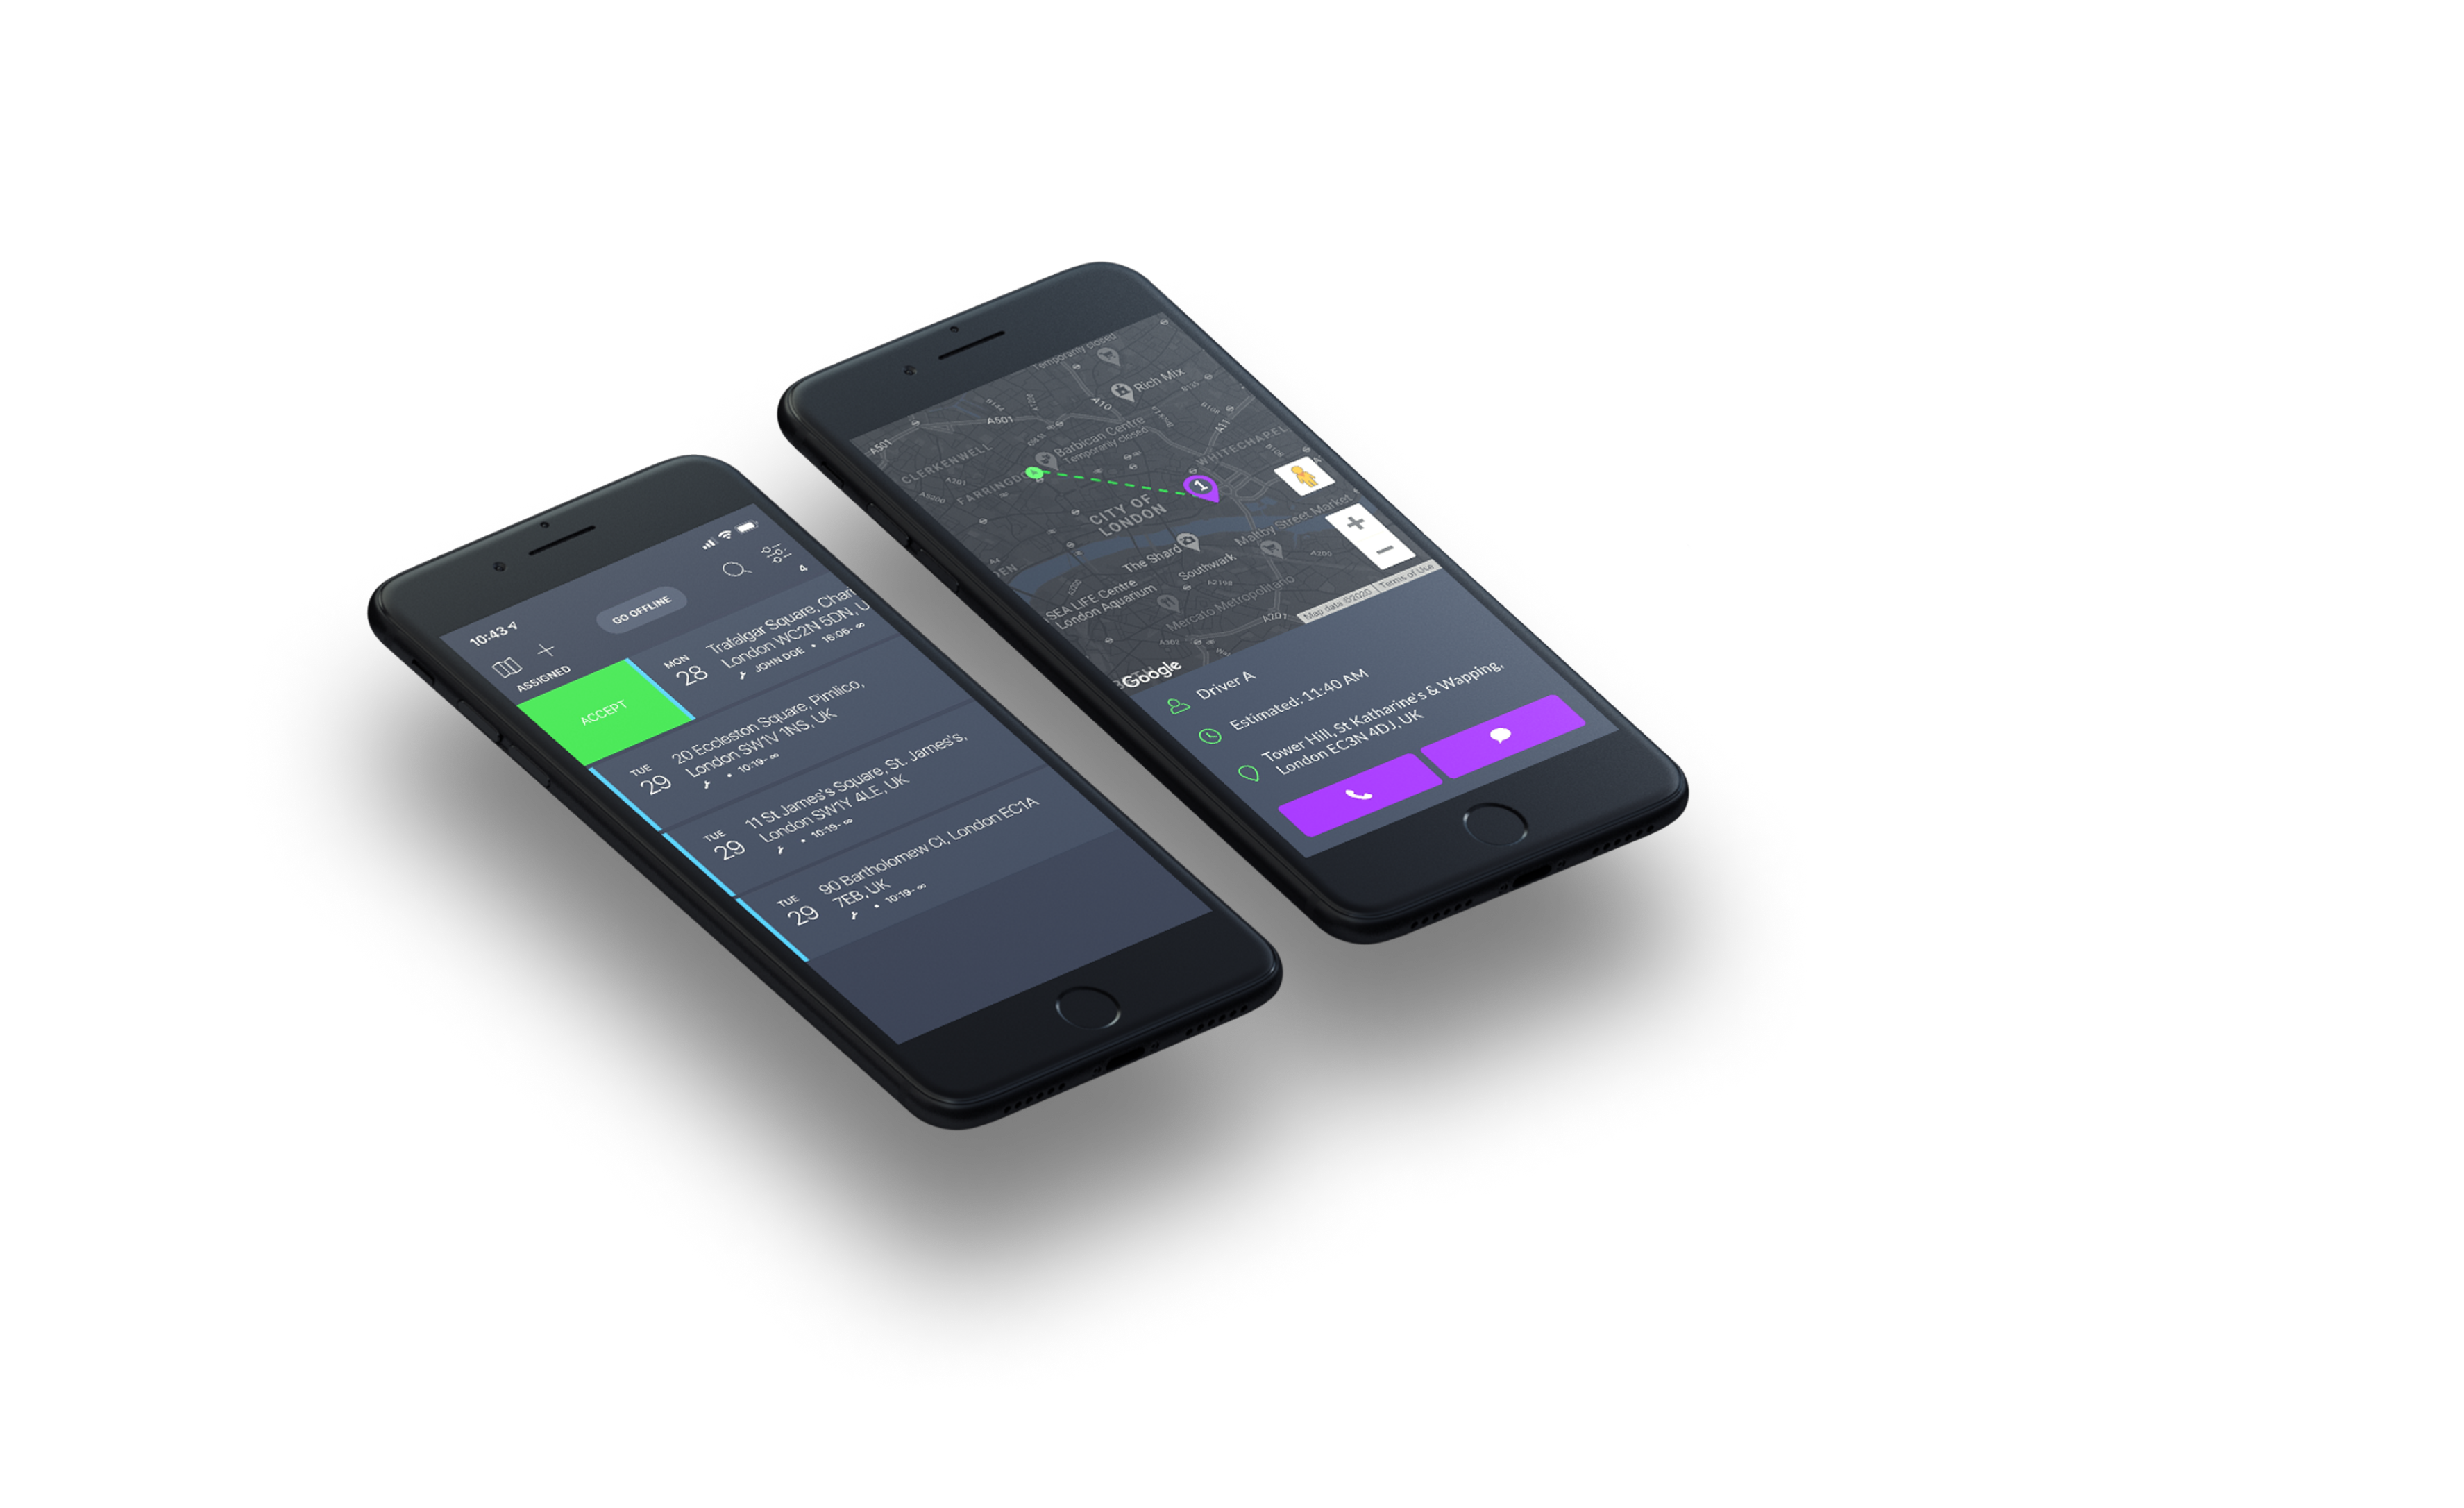 Mobiles displaying GSMTasks interface